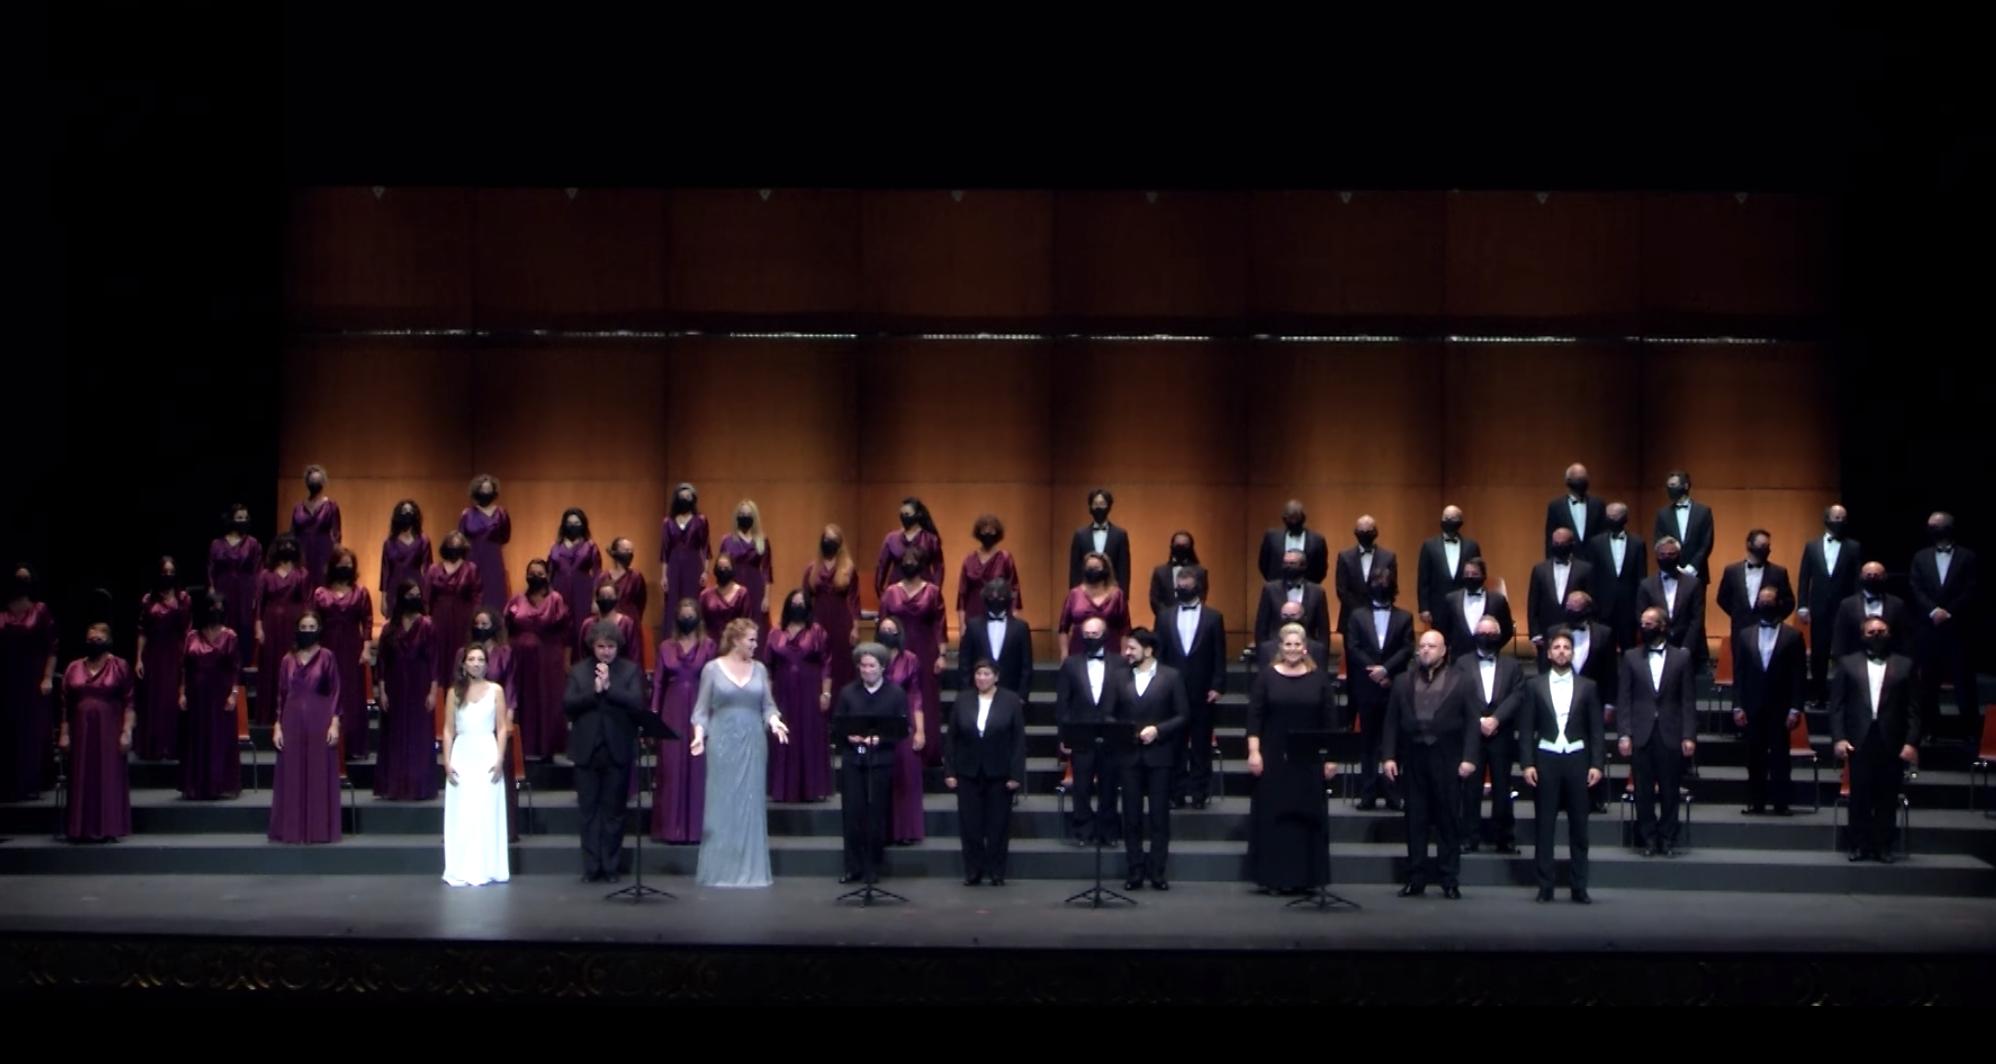 Crítica: Il Trovatore en el Teatre del Liceu